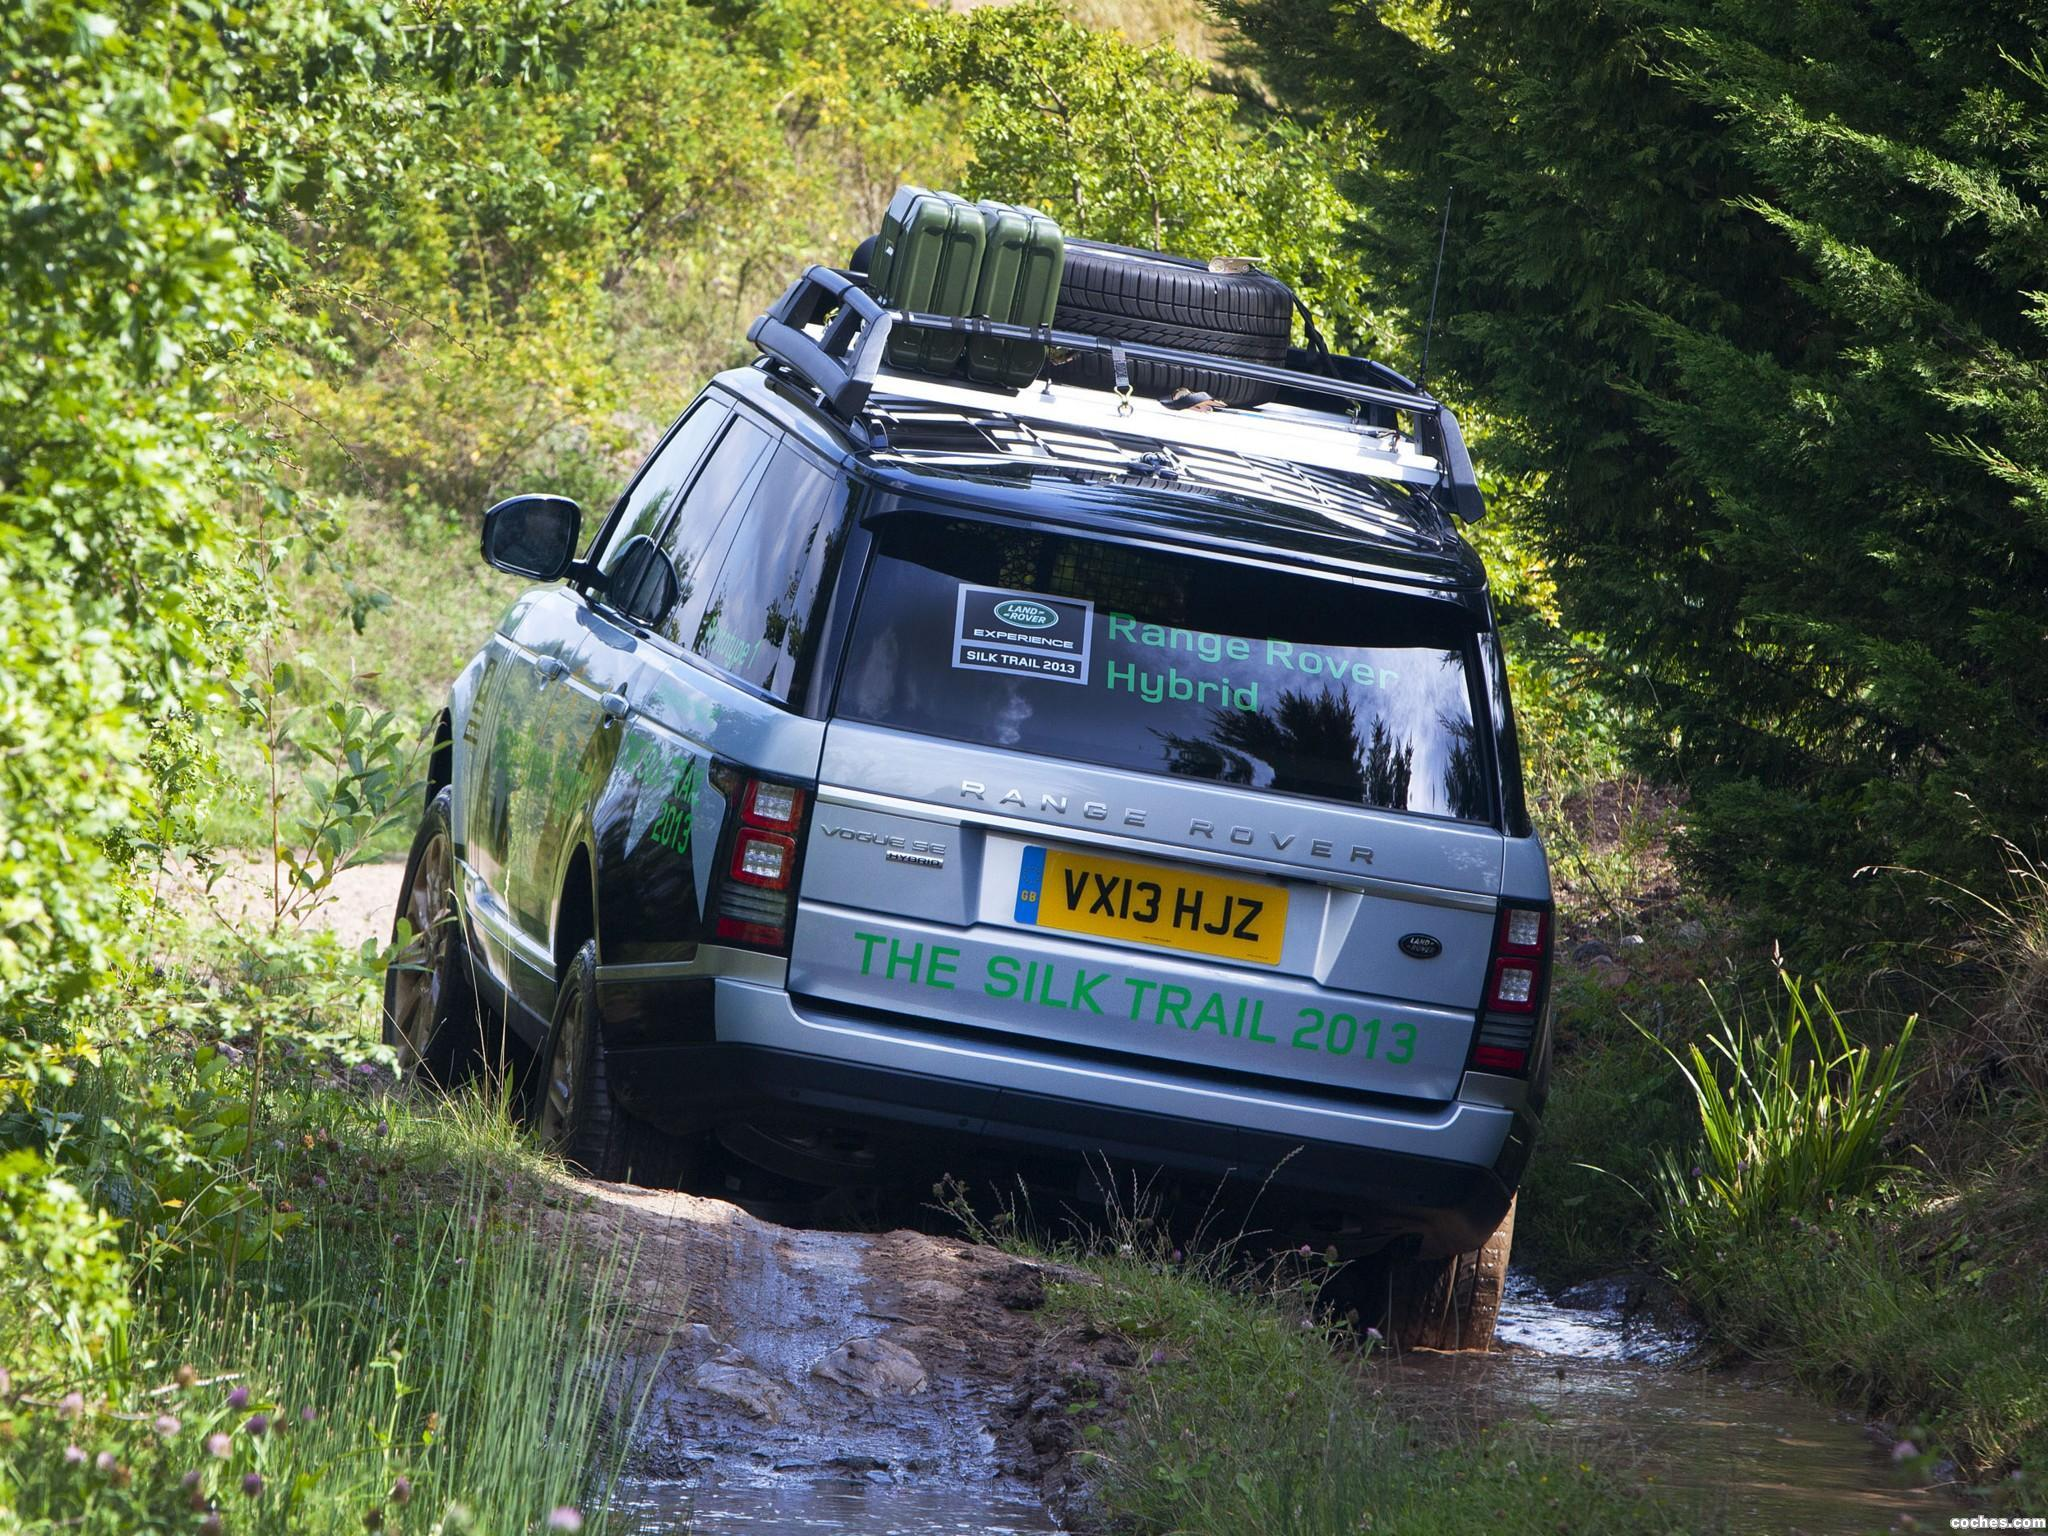 Foto 2 de Land Rover Range Rover Hybrid Prototype L405 2013